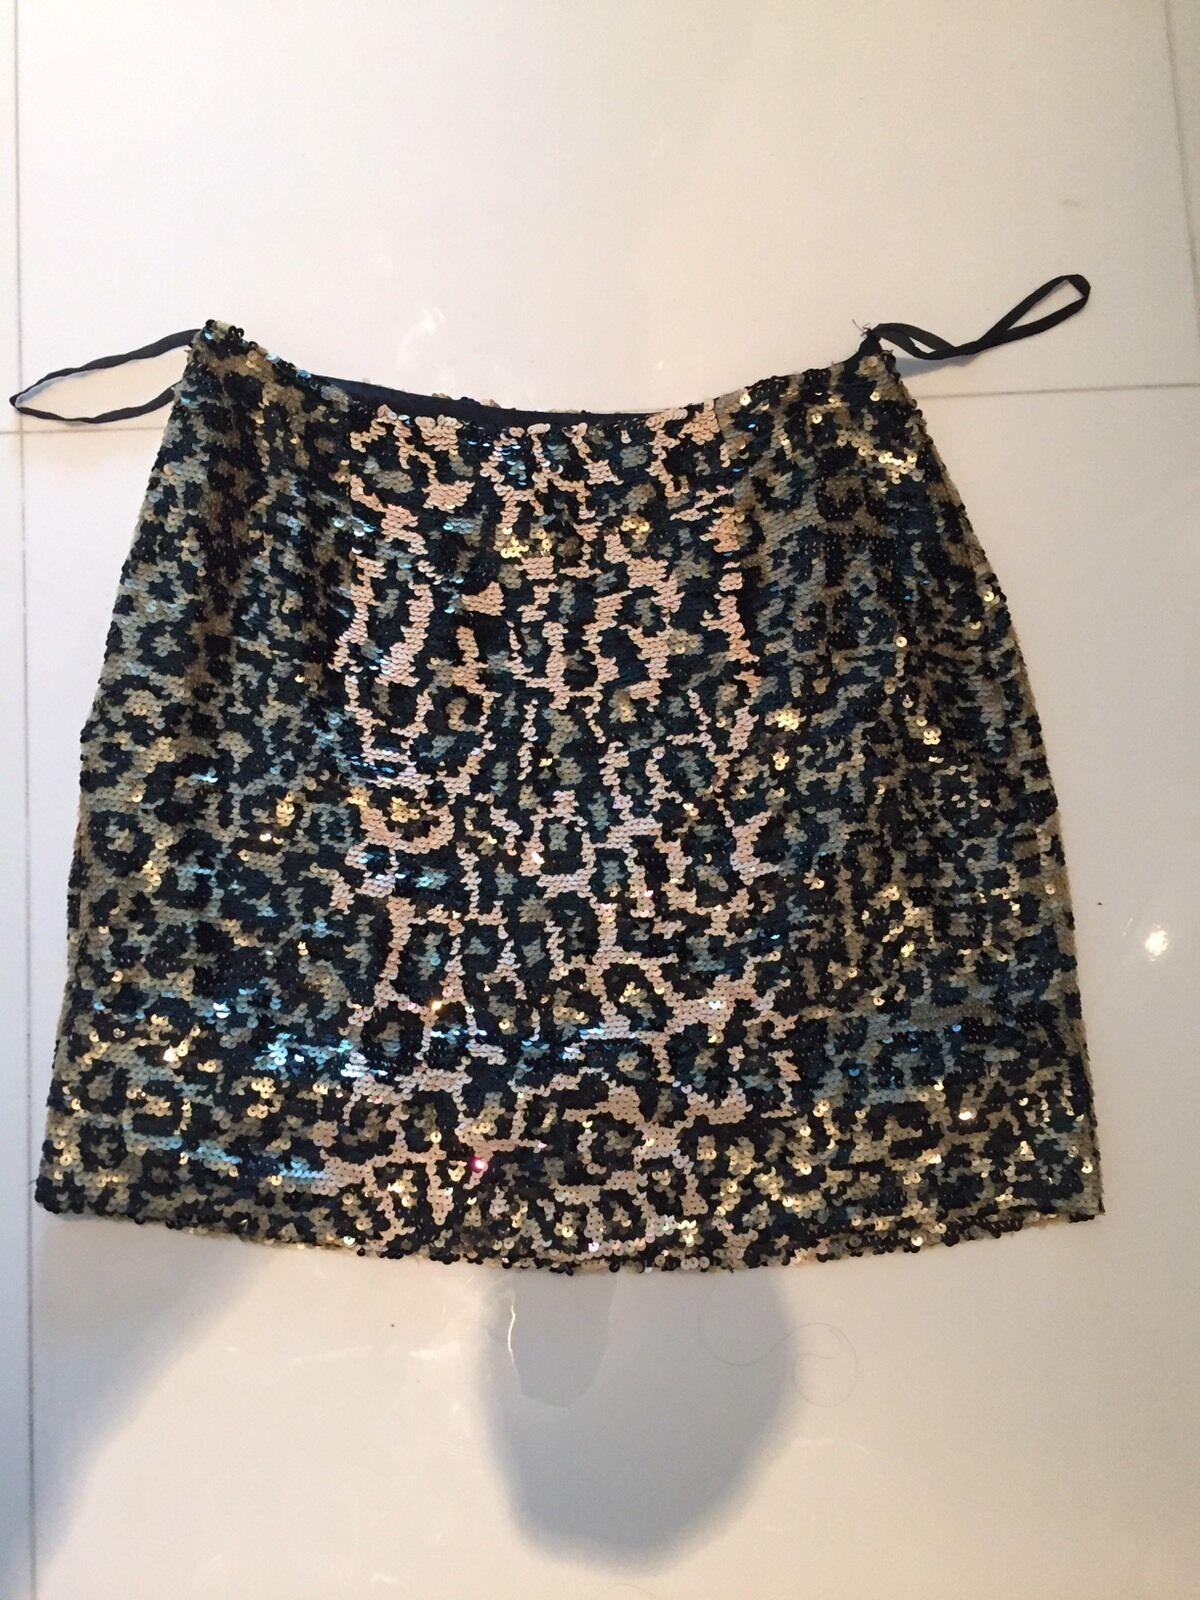 Vintage Leopard Sequin Skirt By Oleg Cassini Small Medium